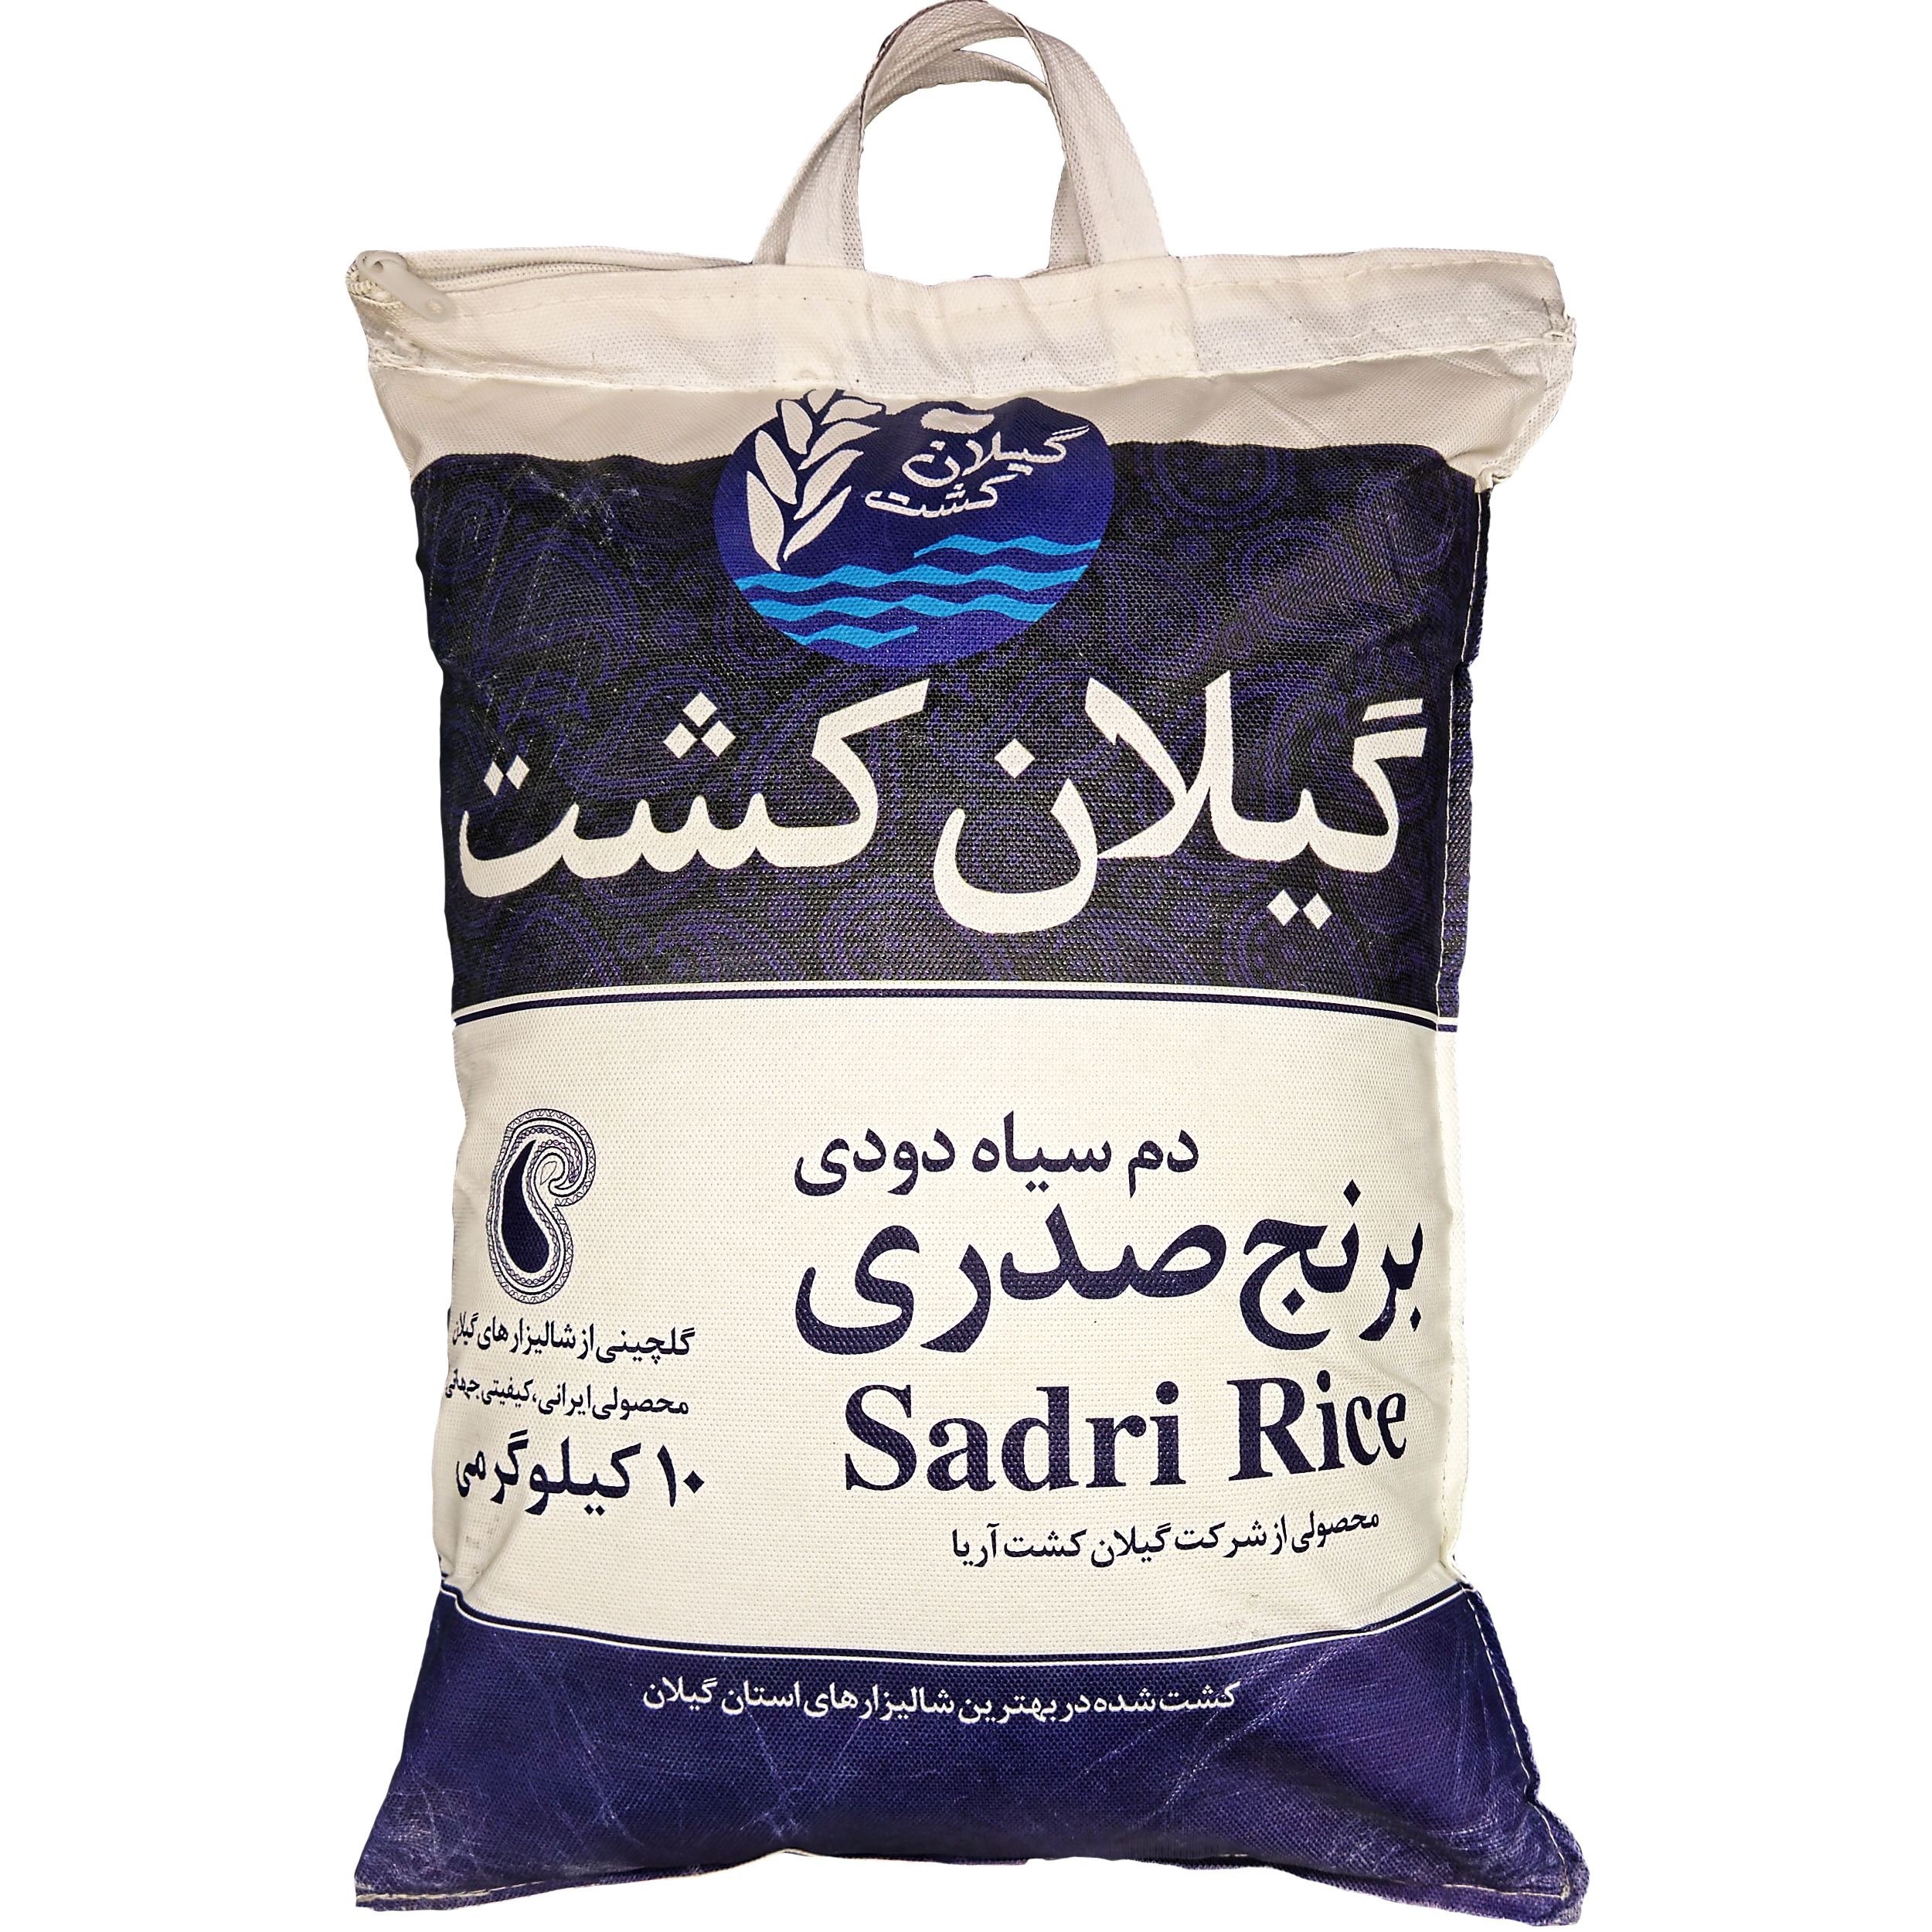 برنج صدری دم سیاه دودی گیلان کشت - 10 کیلوگرم